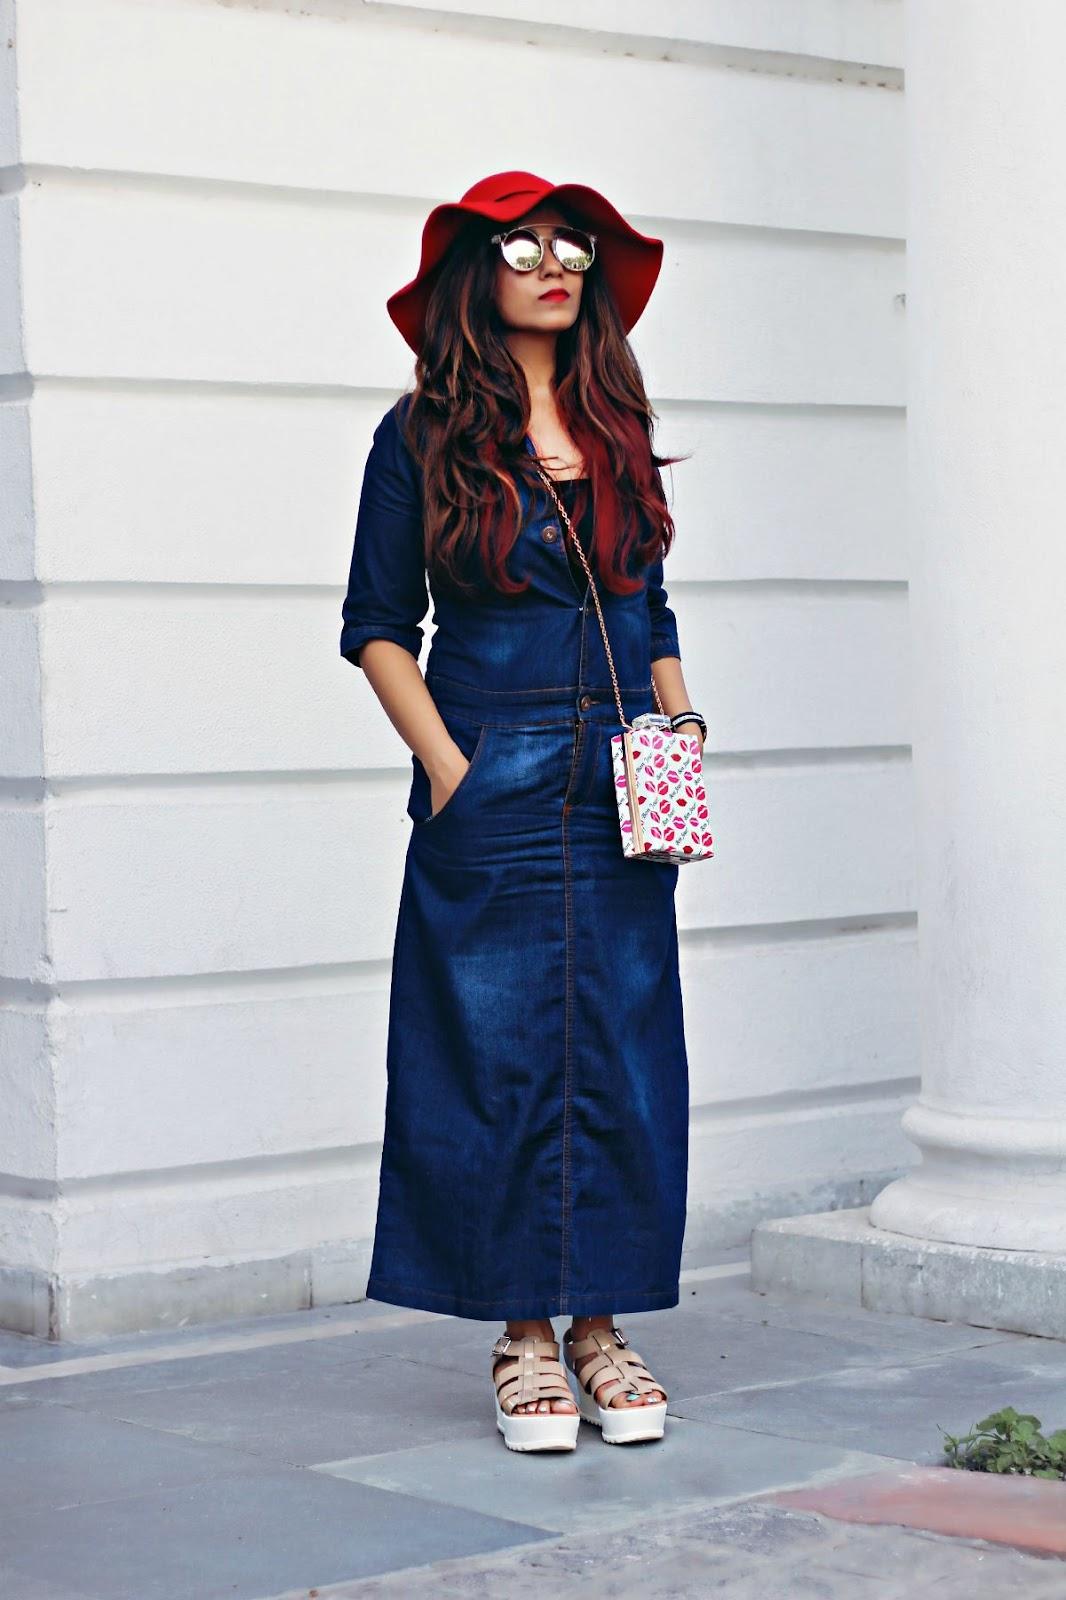 fashion week london, london street style